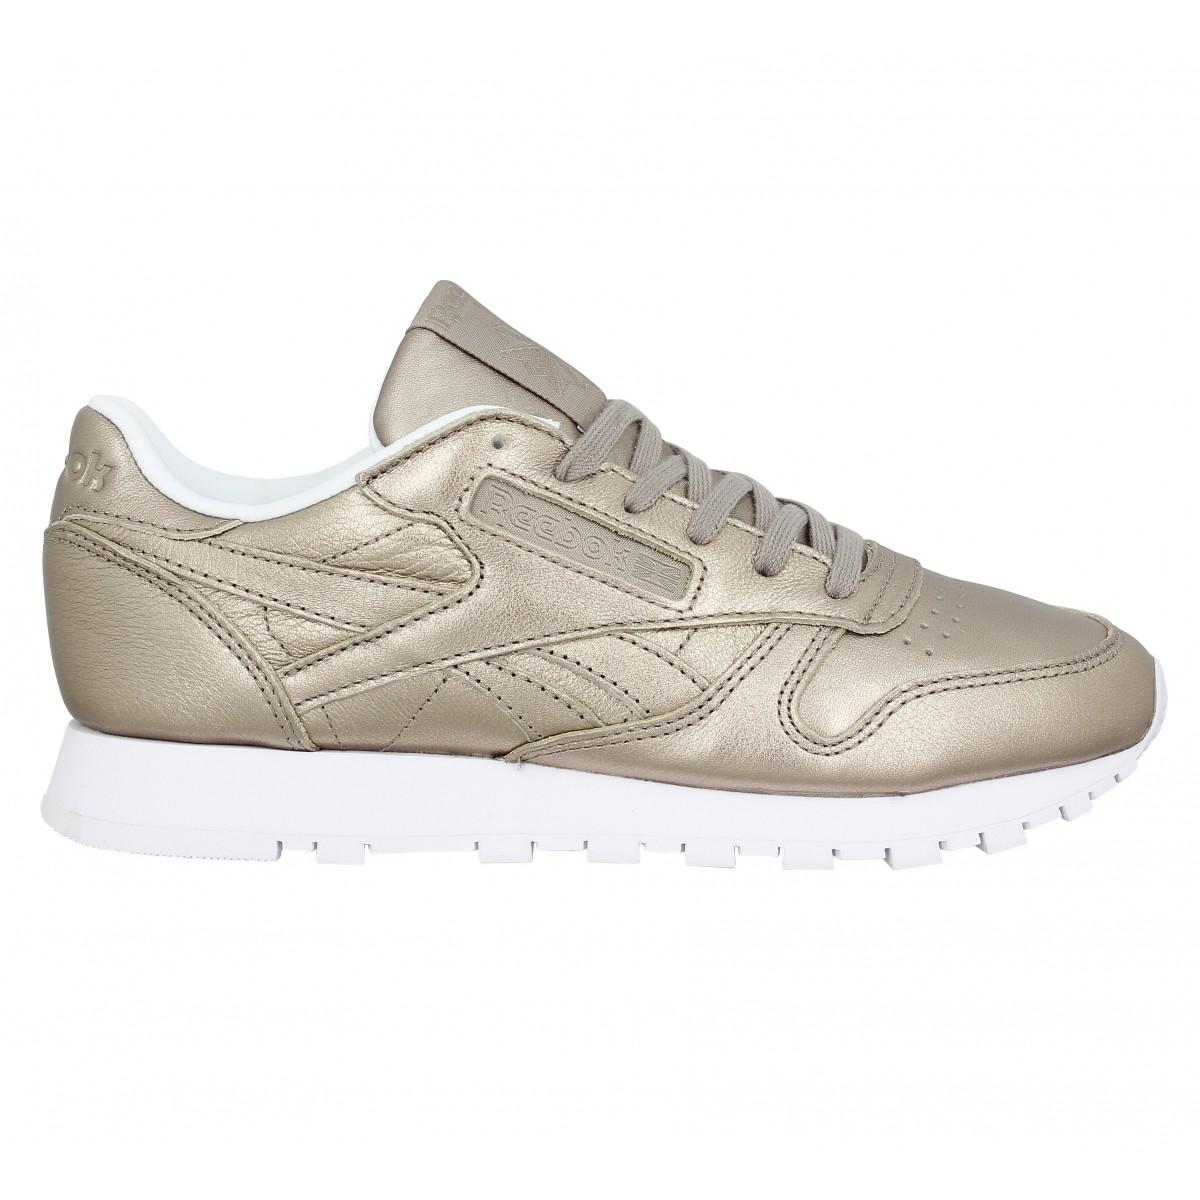 Chaussures Reebok Cuir Classique Femme bO3VYxL